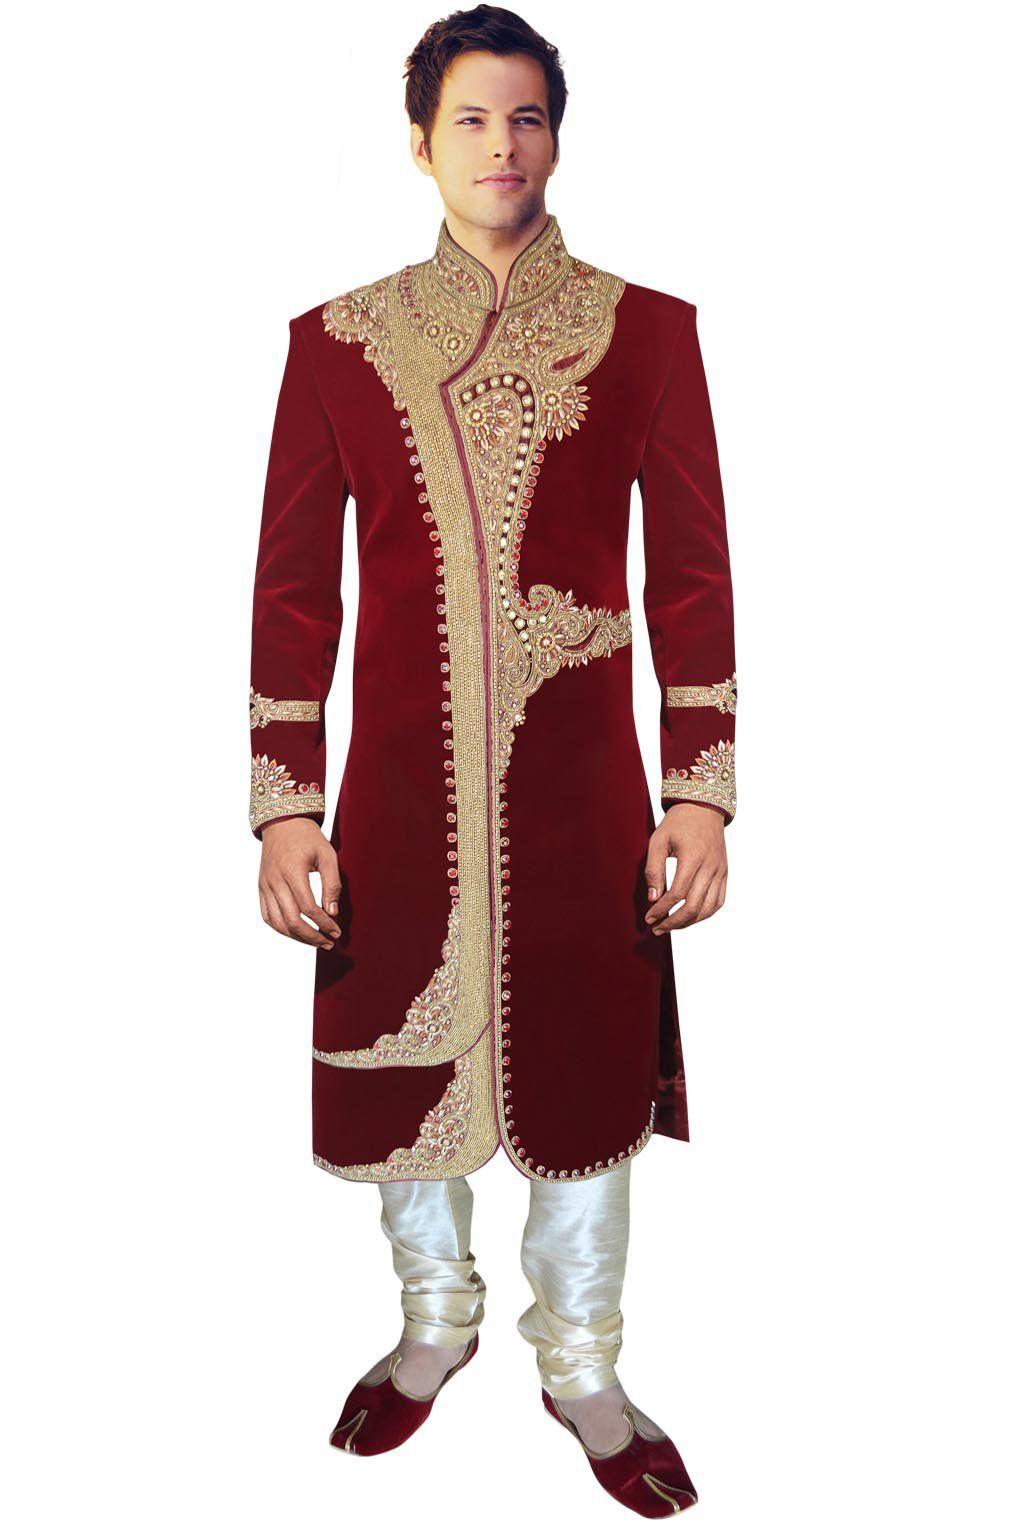 Inmonarch Mens Traditional Velvet Wedding Maroon Sherwani Sh423 At Amazon Men S Clothing Store Maroon Wedding Wedding Sherwani Sherwani